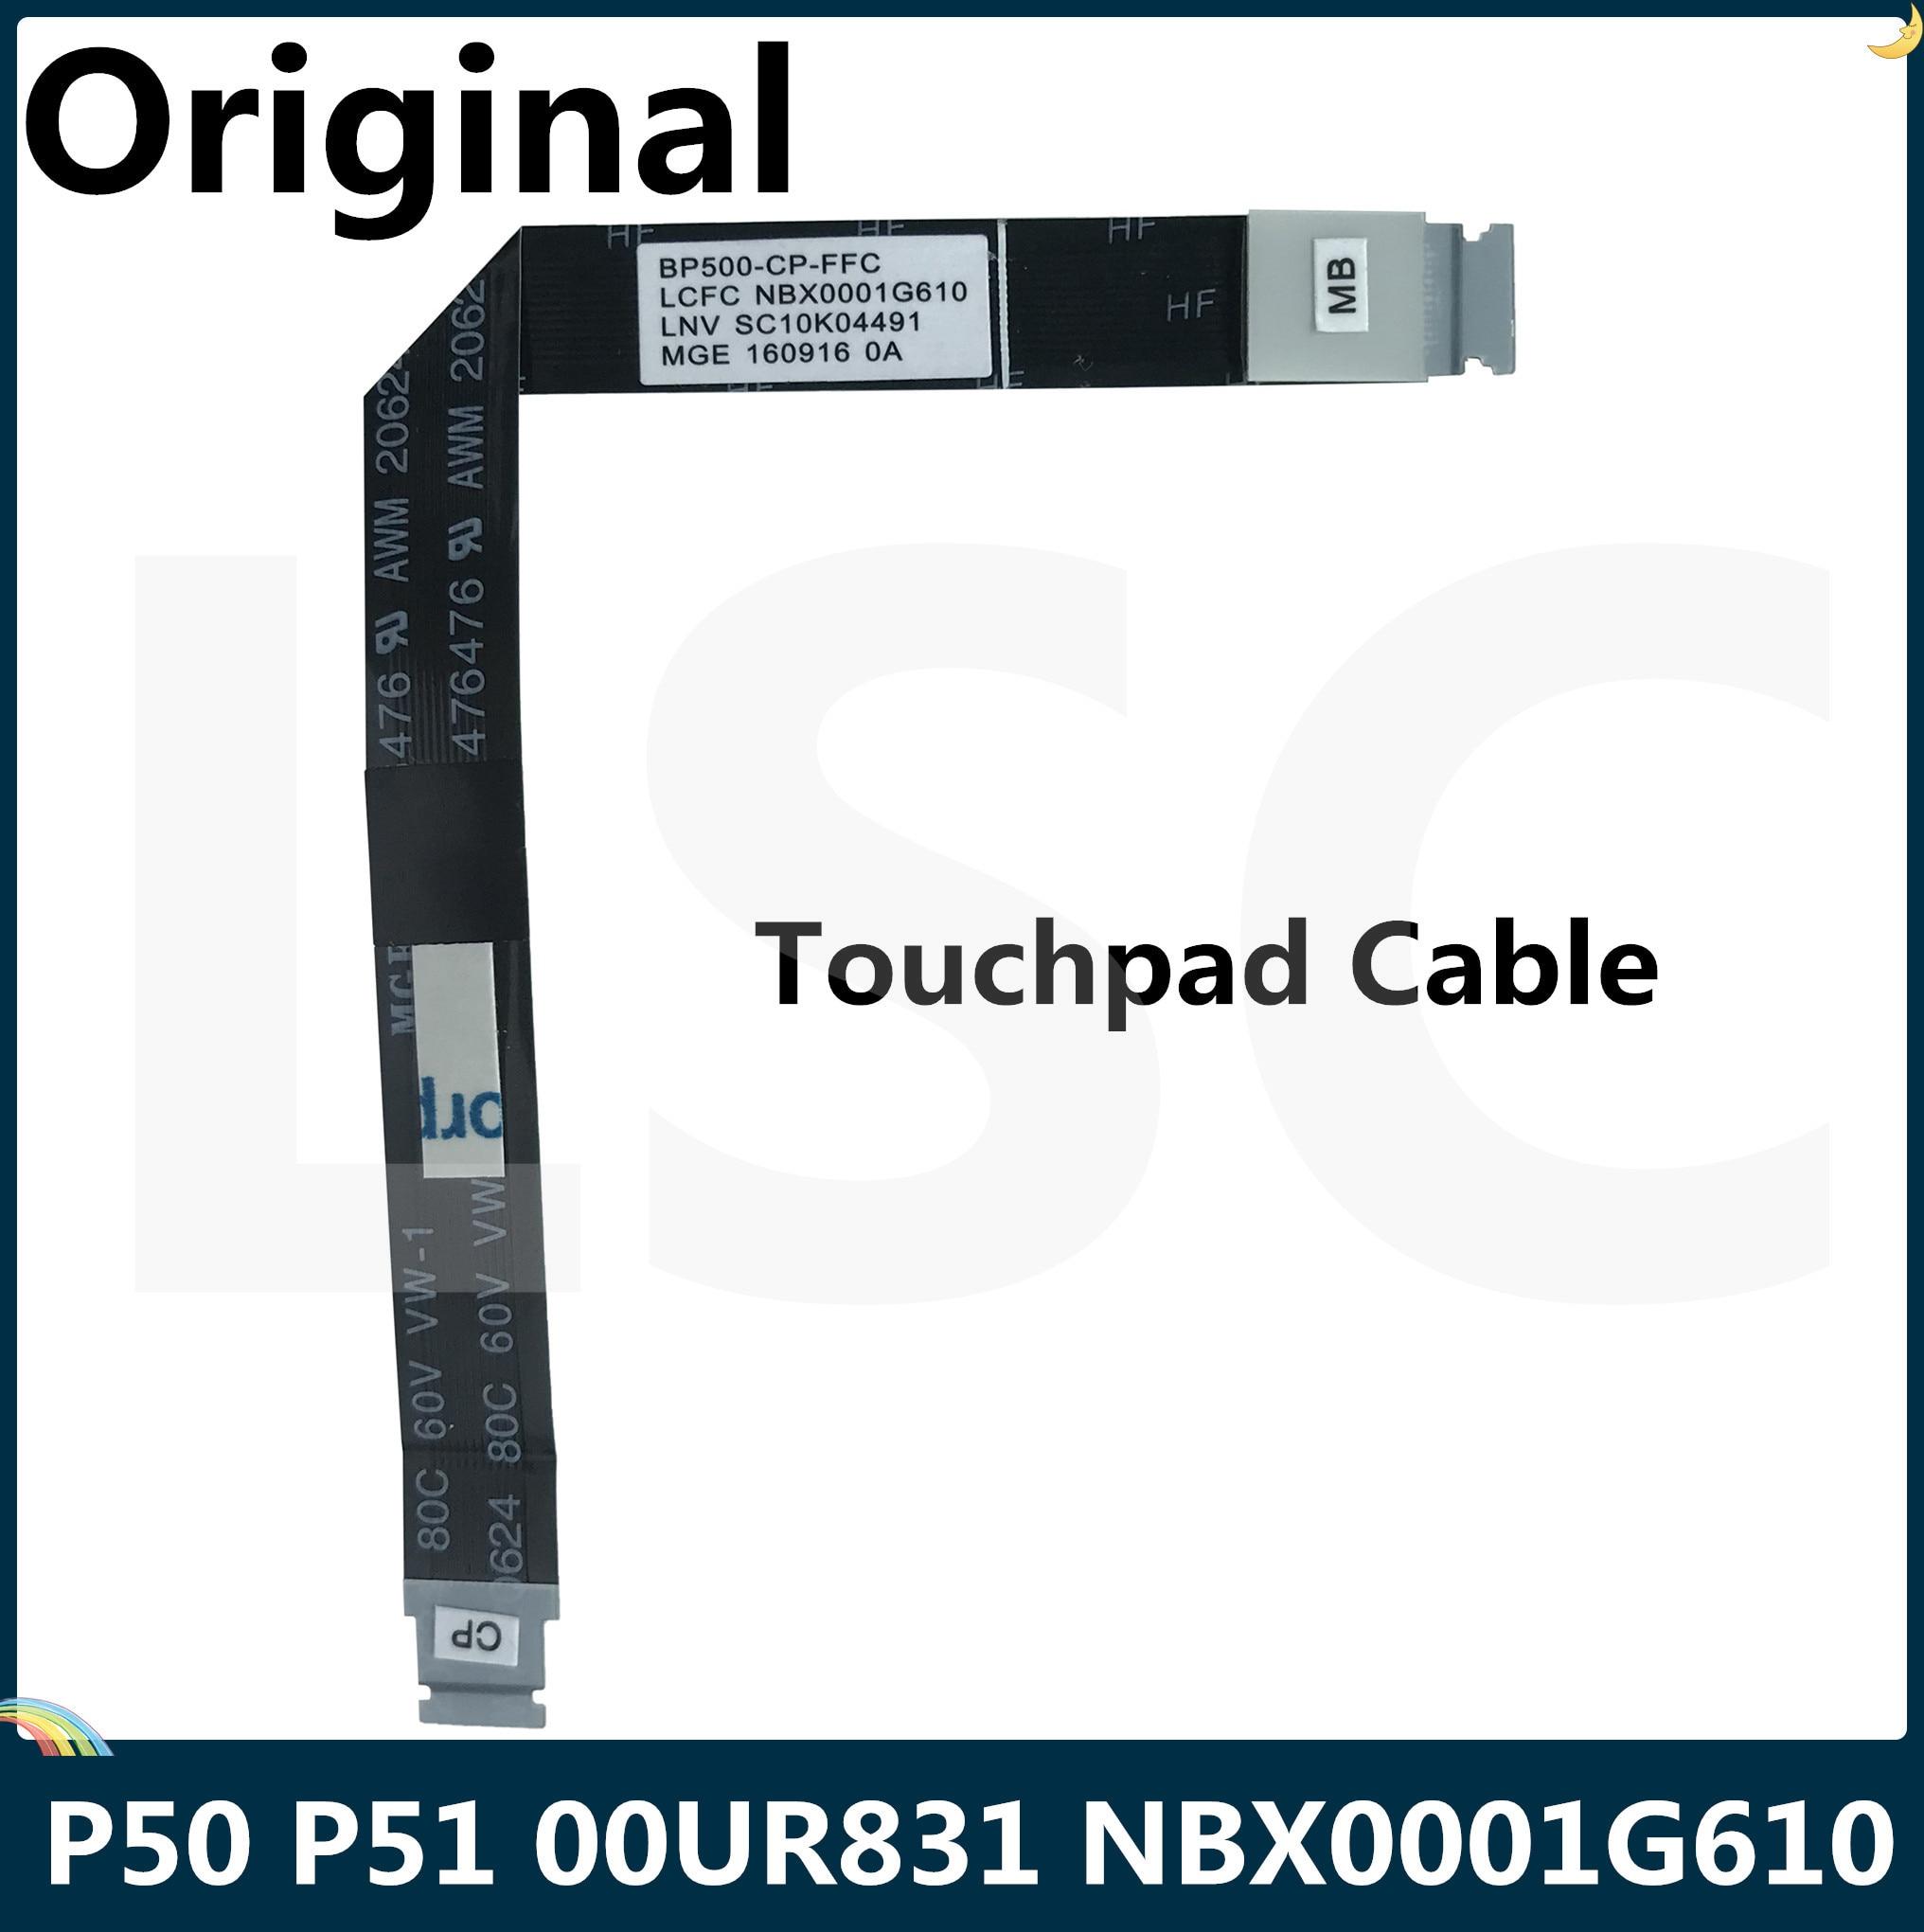 LSC новый оригинальный кабель для мыши Lenovo ThinkPad P50 P51 BP500 CP FFC тачпад кабель 00UR831 NBX0001G610 SC10K04491